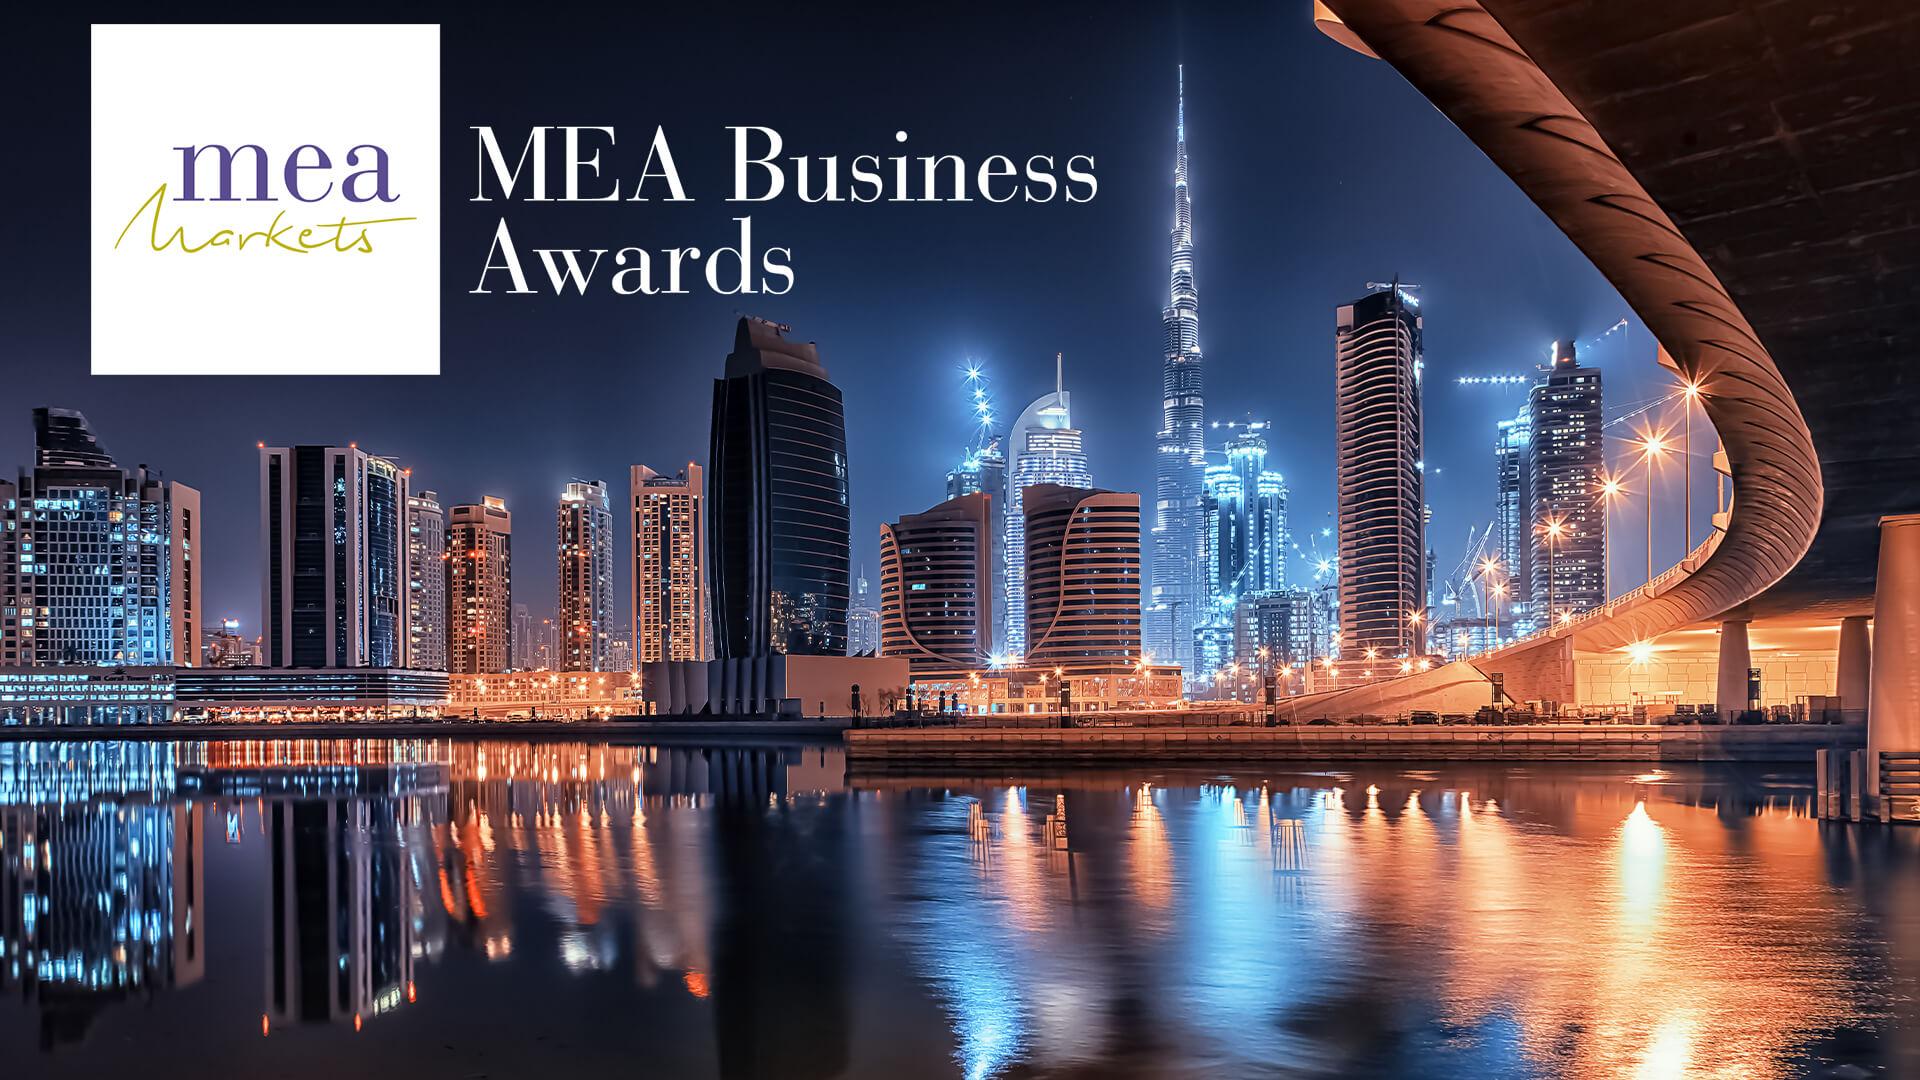 mea business awards